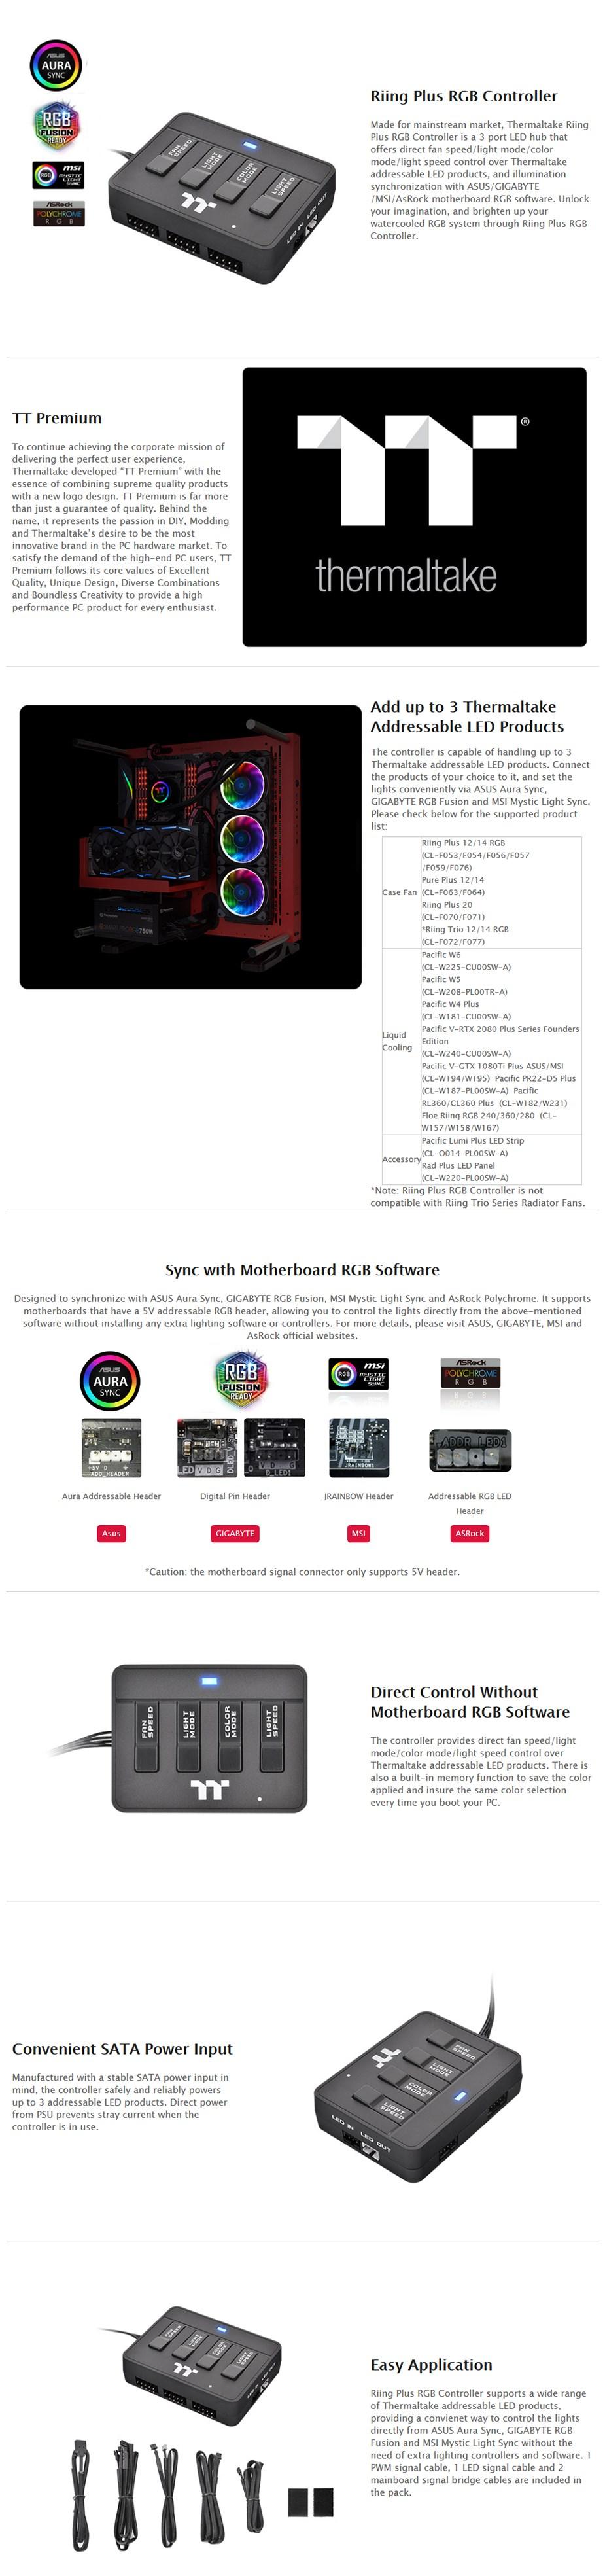 Thermaltake Riing Plus RGB Fan Controller - Desktop Overview 1